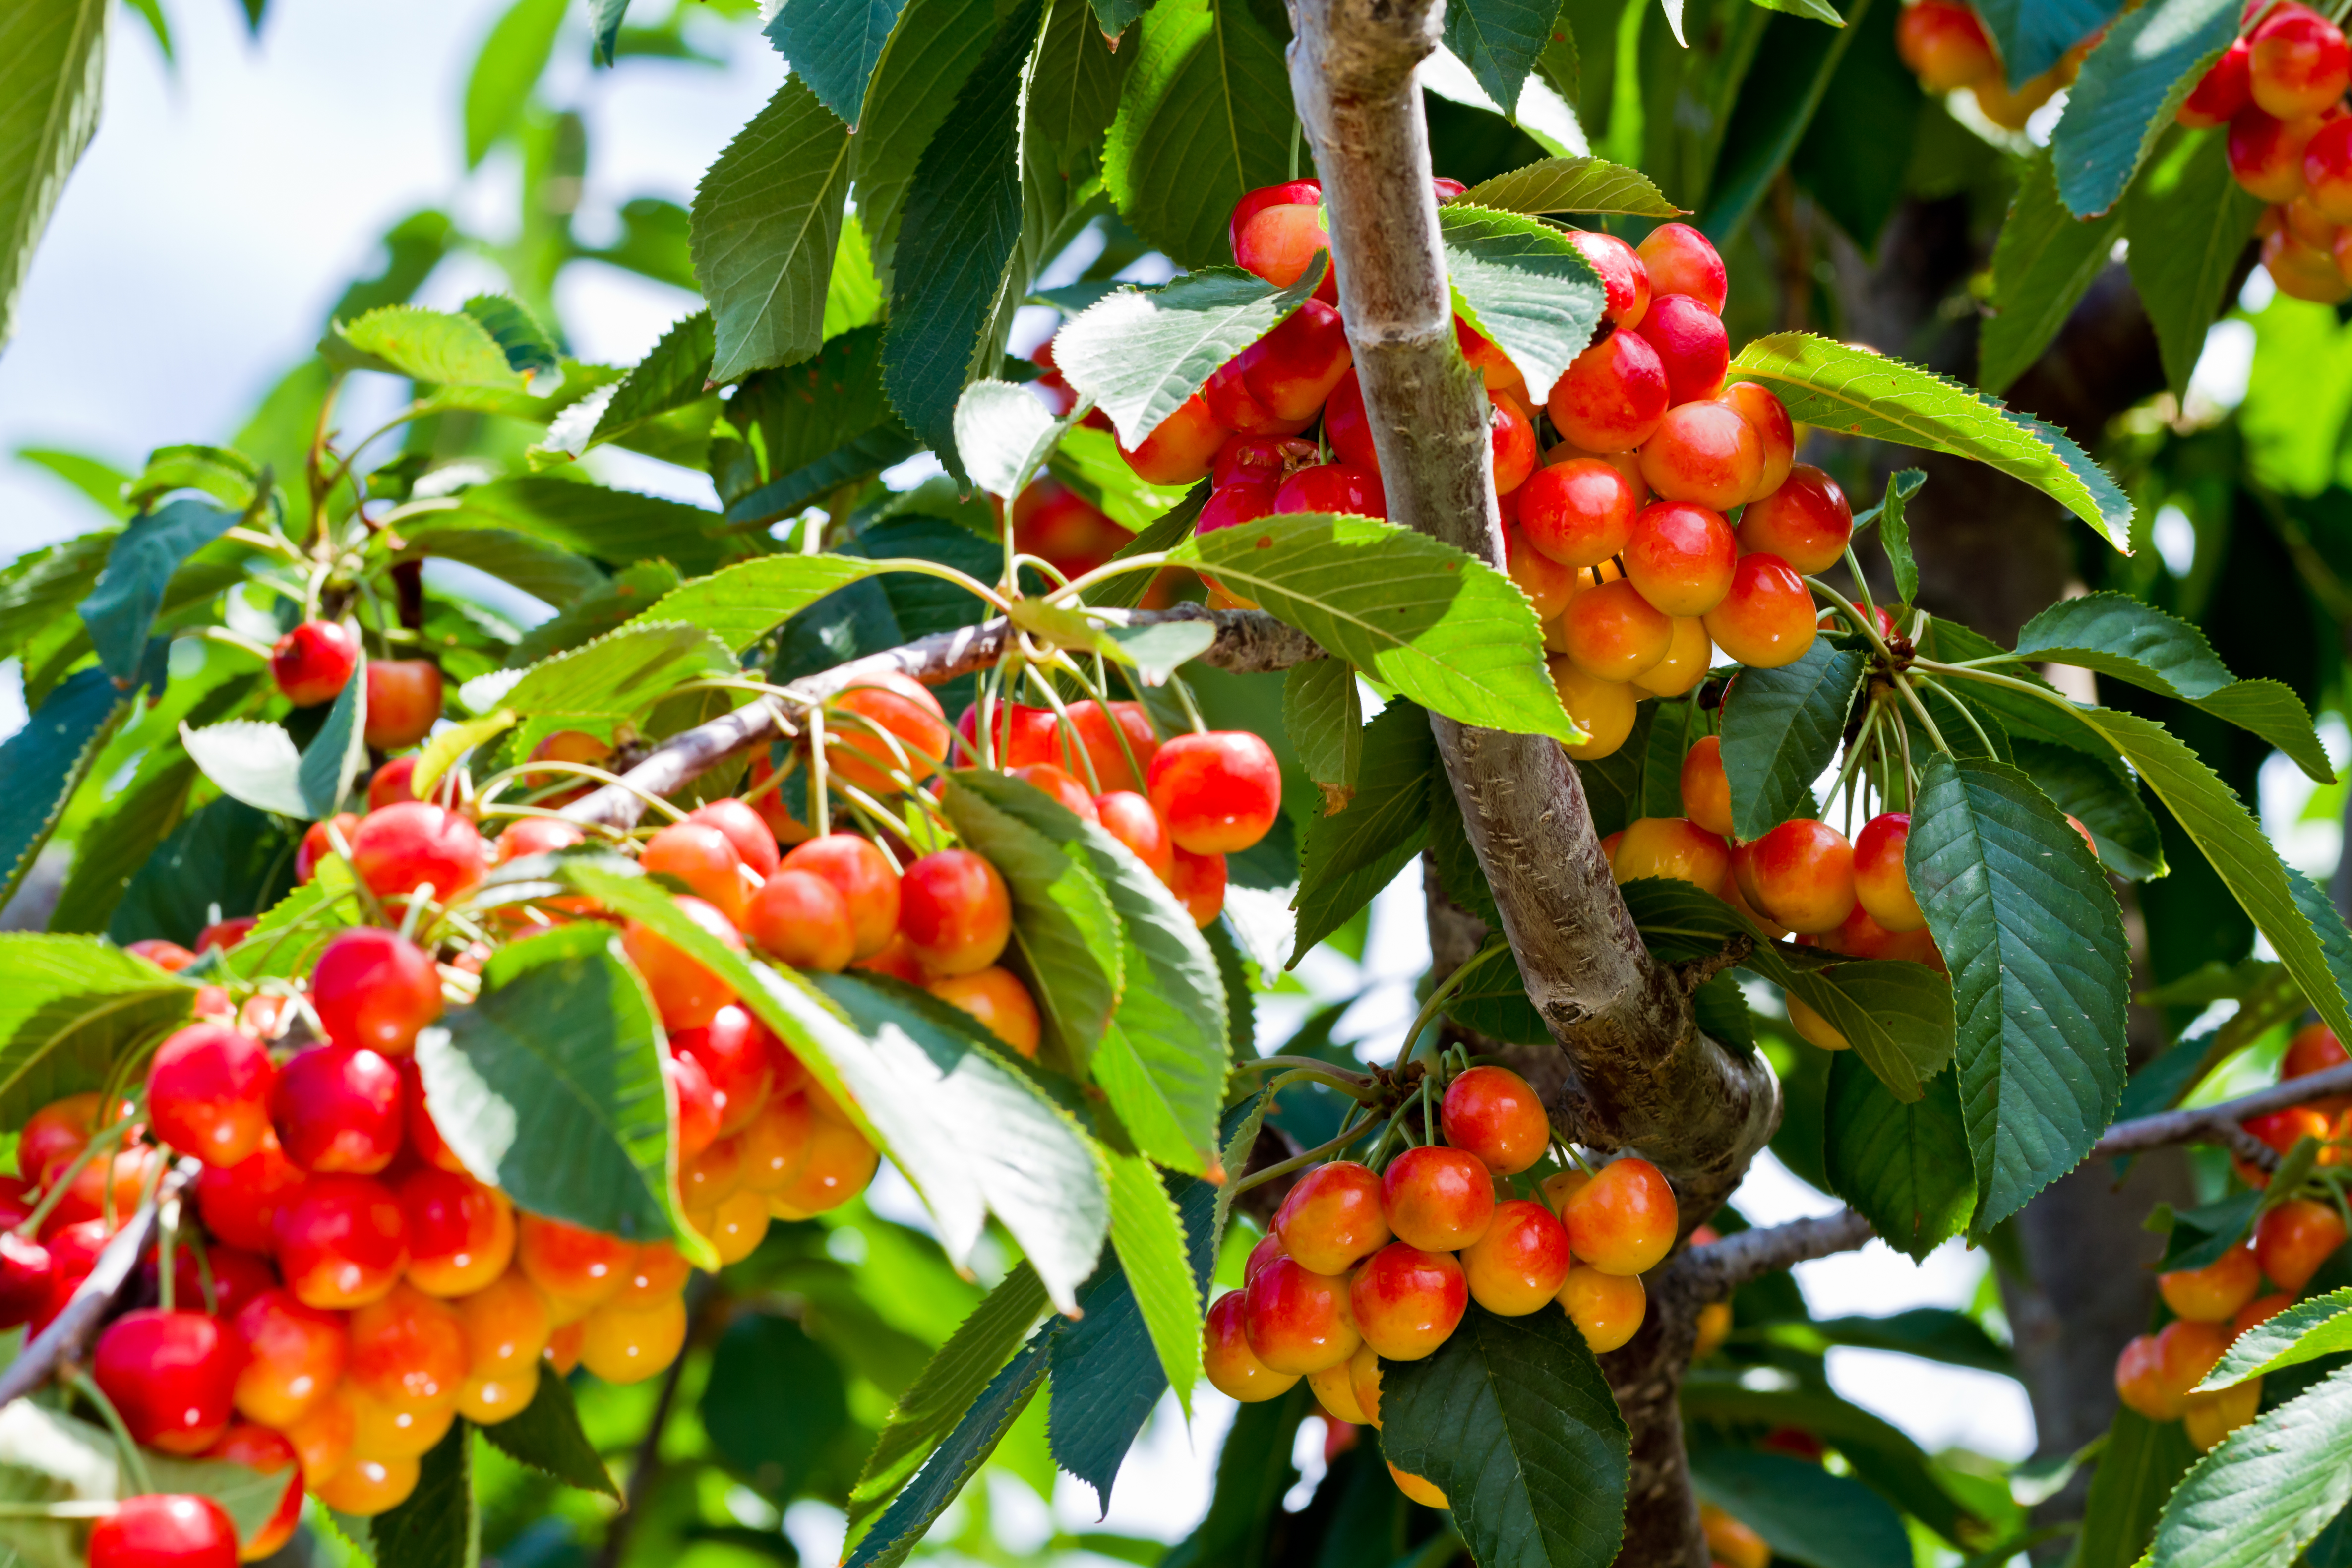 Cherries-31.jpg